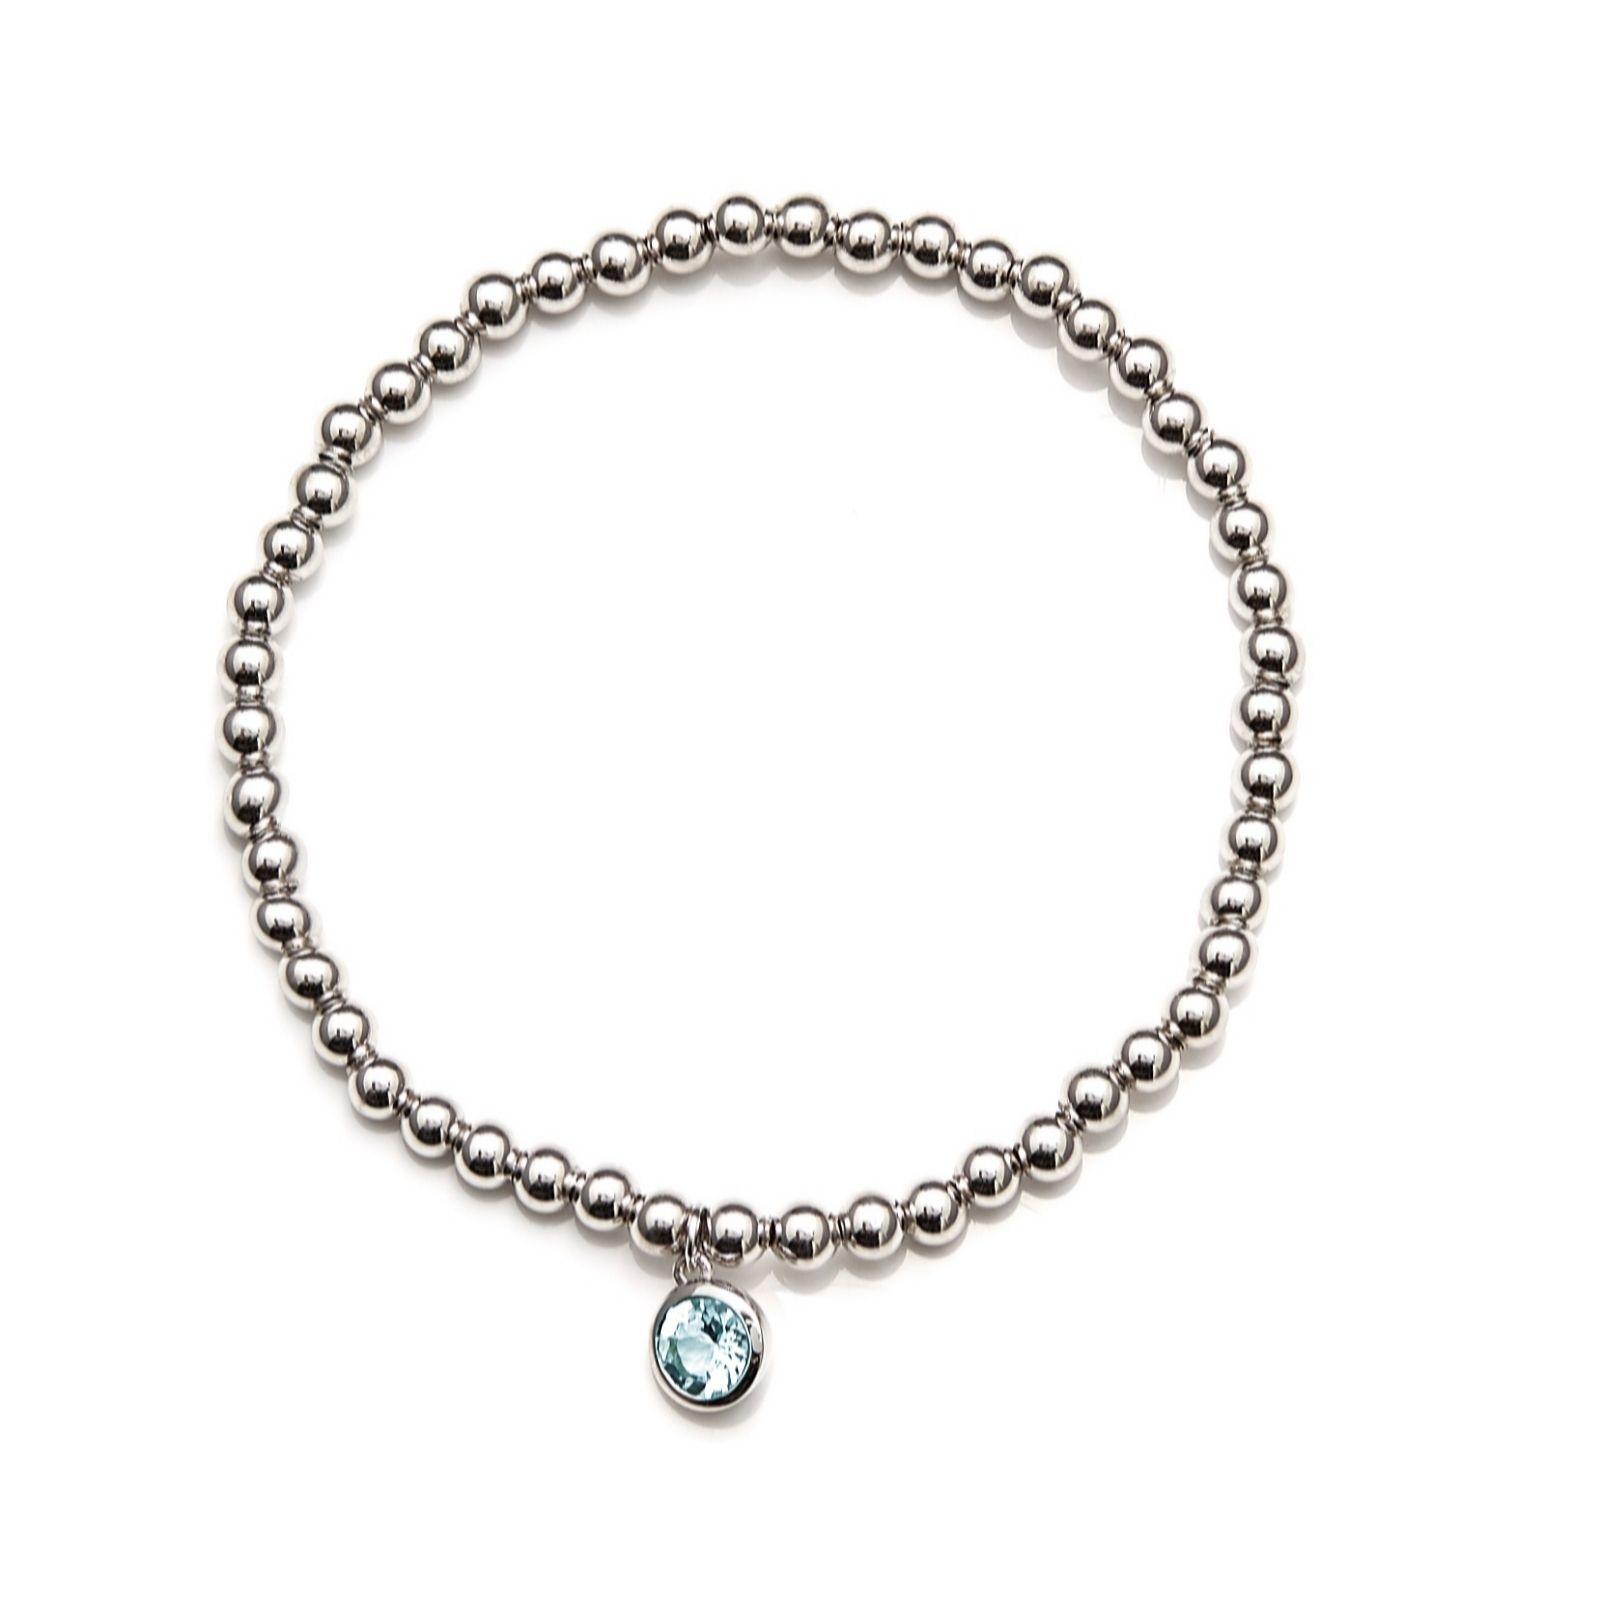 7ad1f90e3be1 0.70ct Aquamarine Beaded Stretch Bracelet Sterling Silver - QVC UK